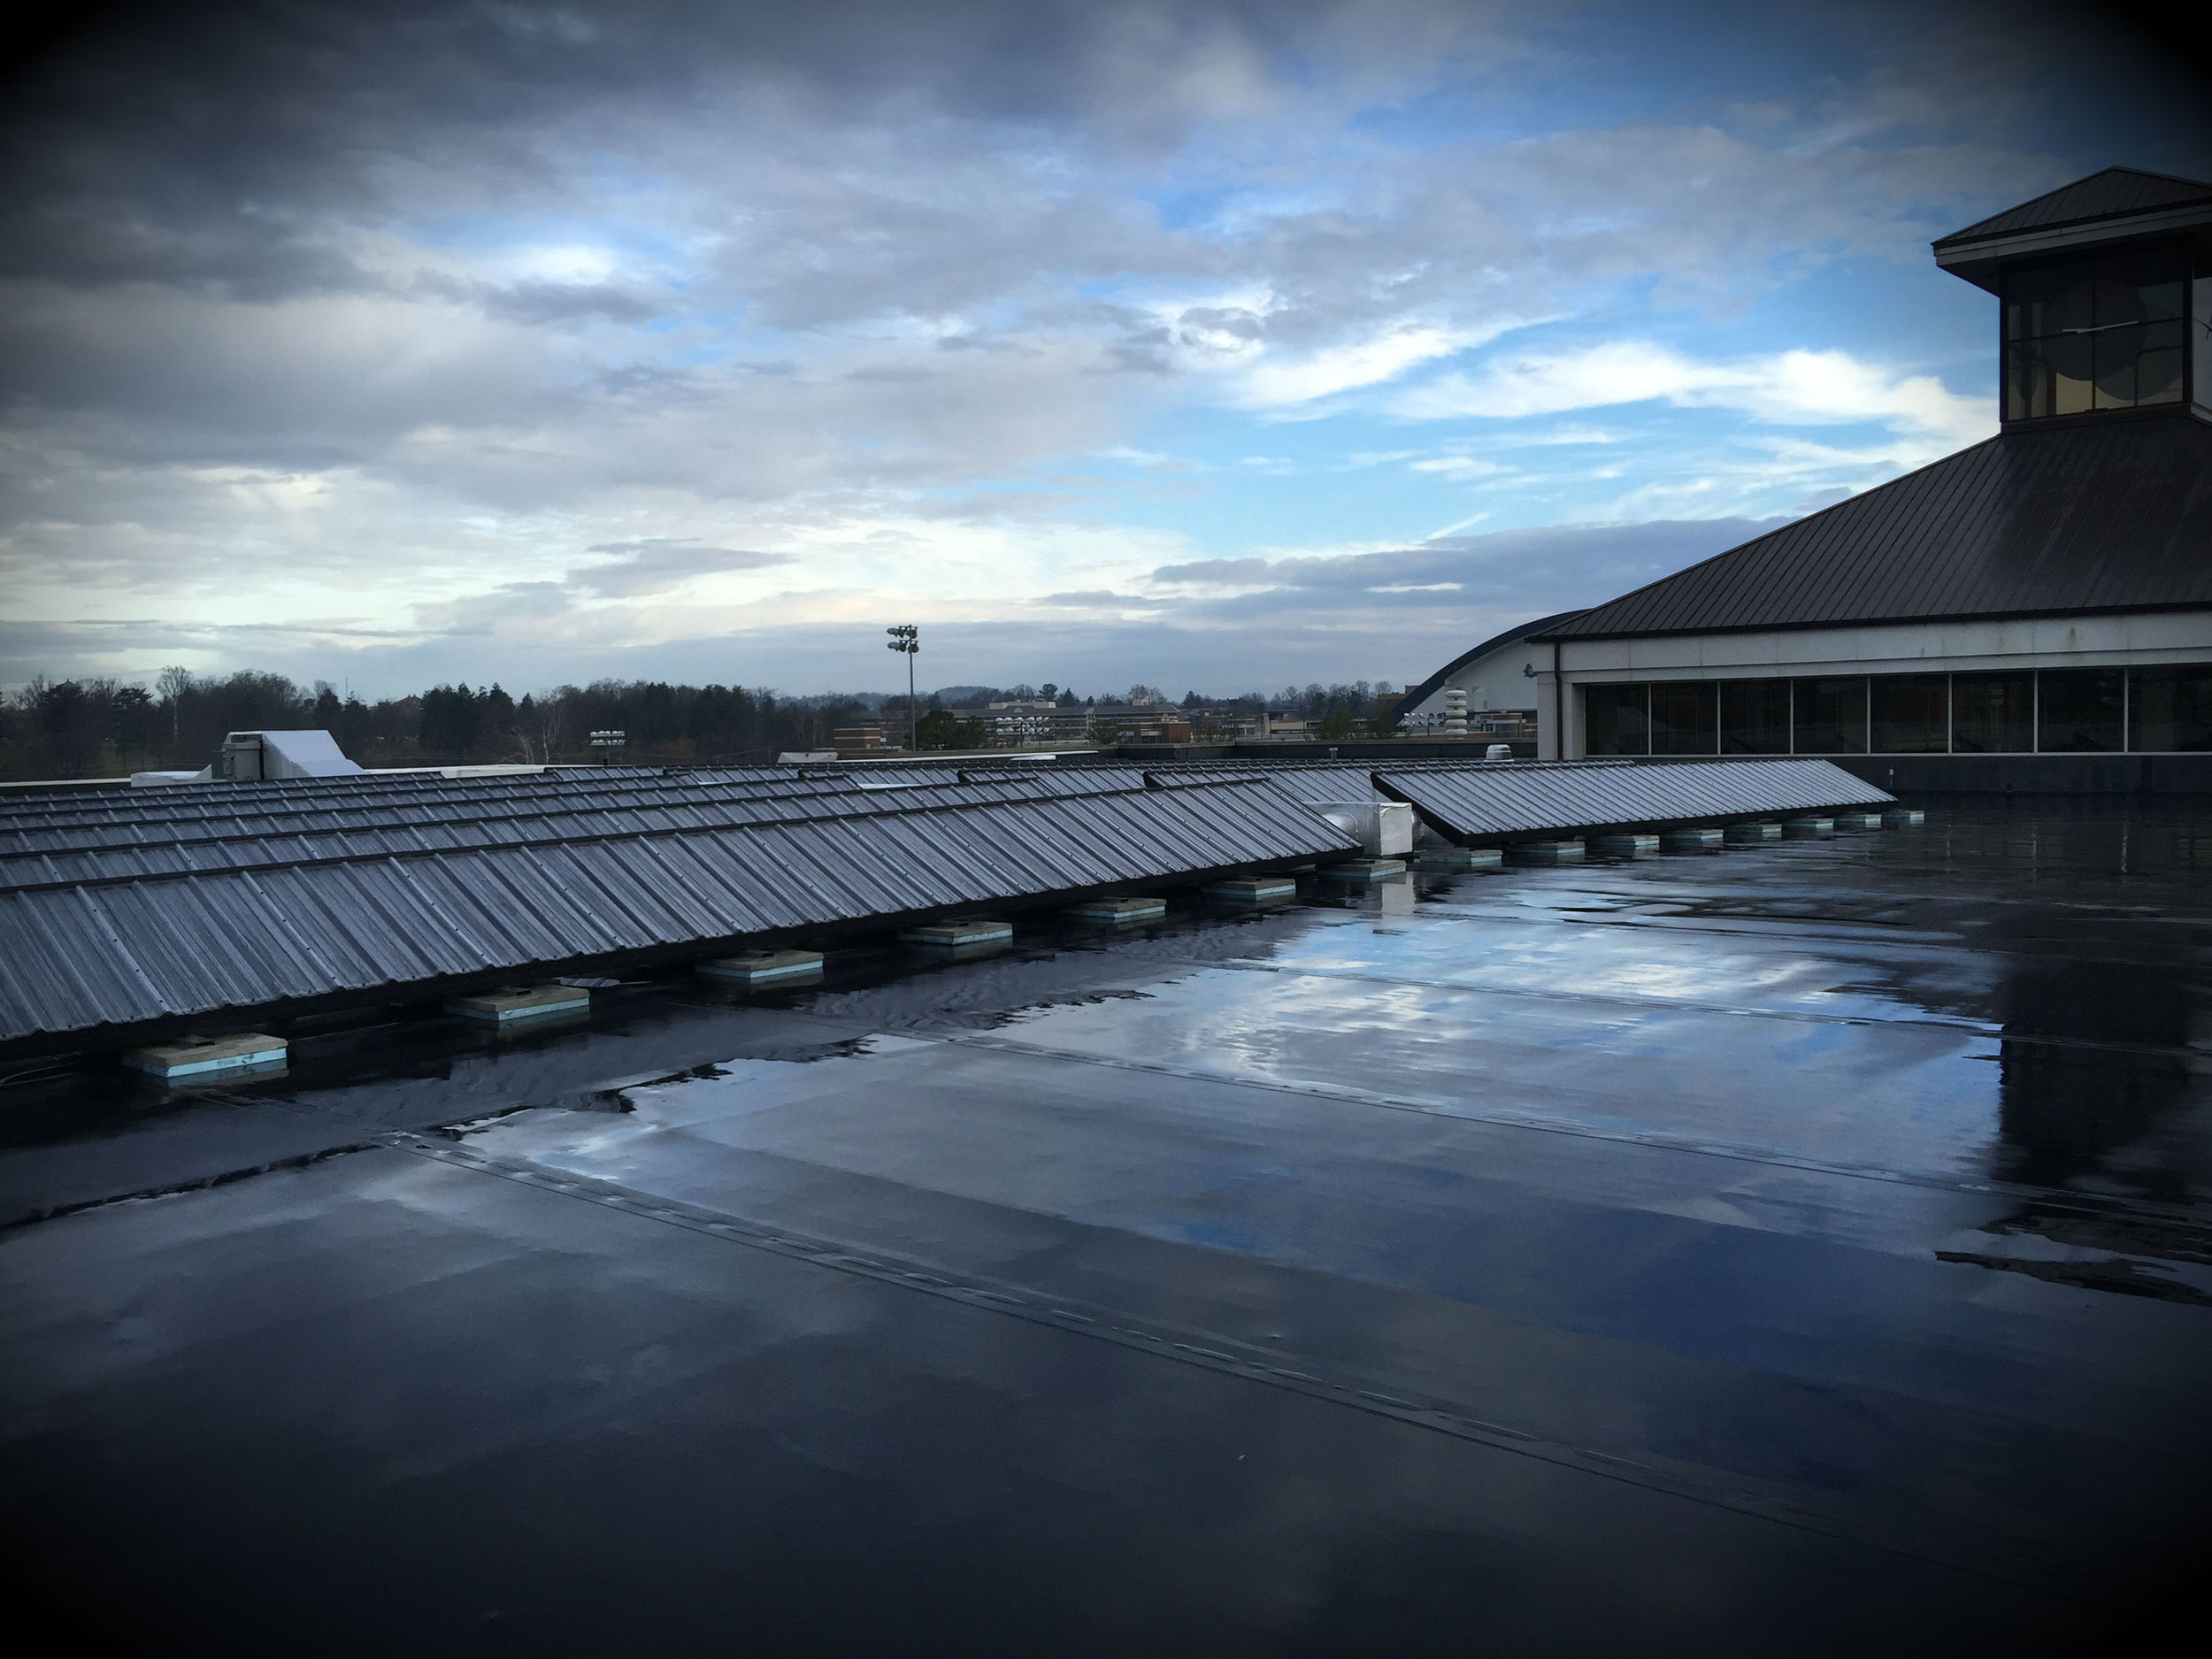 ETSU Center for Physical Activity Solar Wall